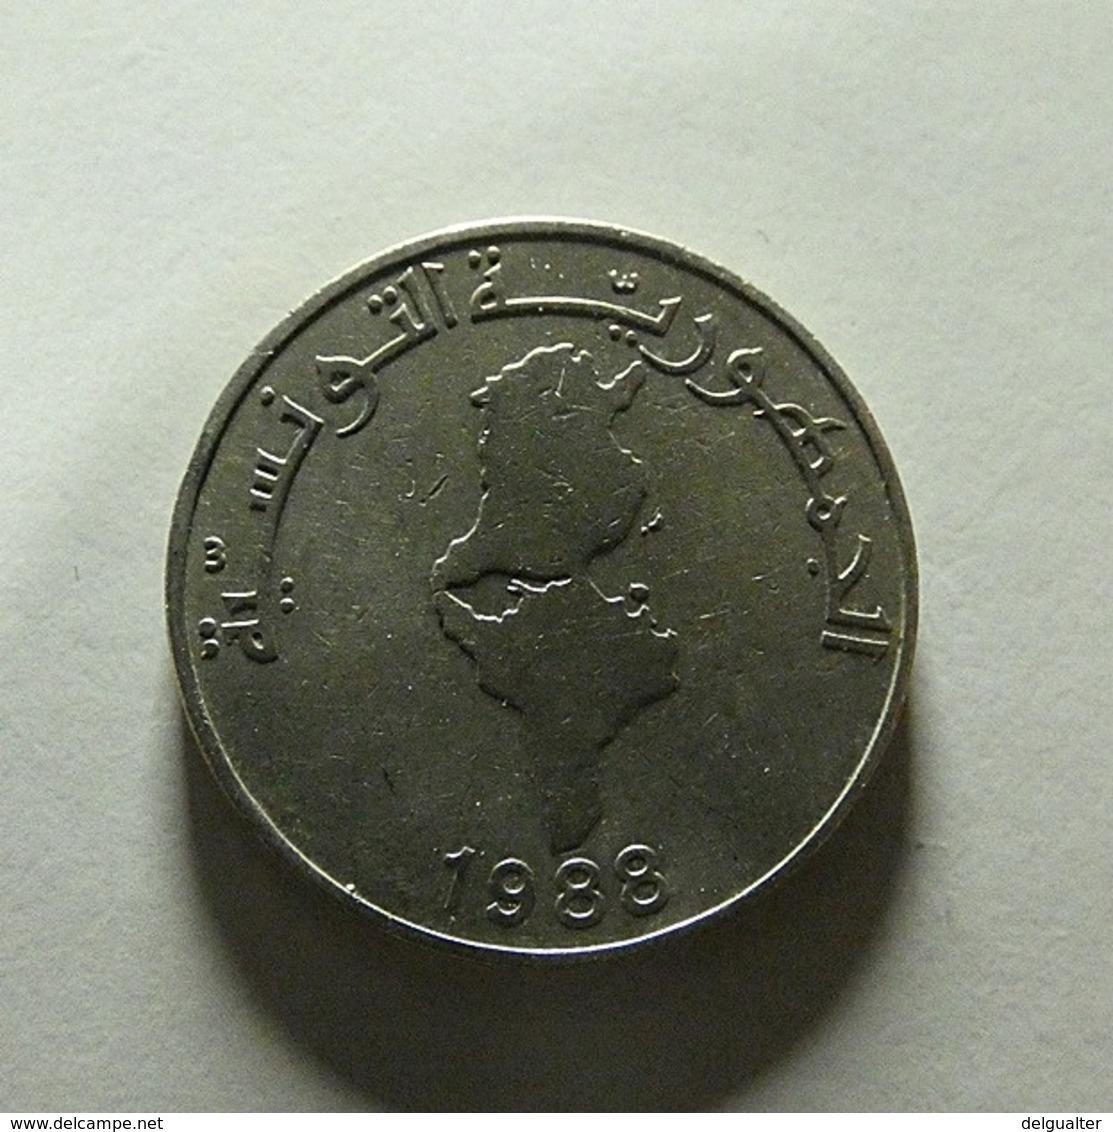 Tunisia 1 Dinar 1988 - Tunisia